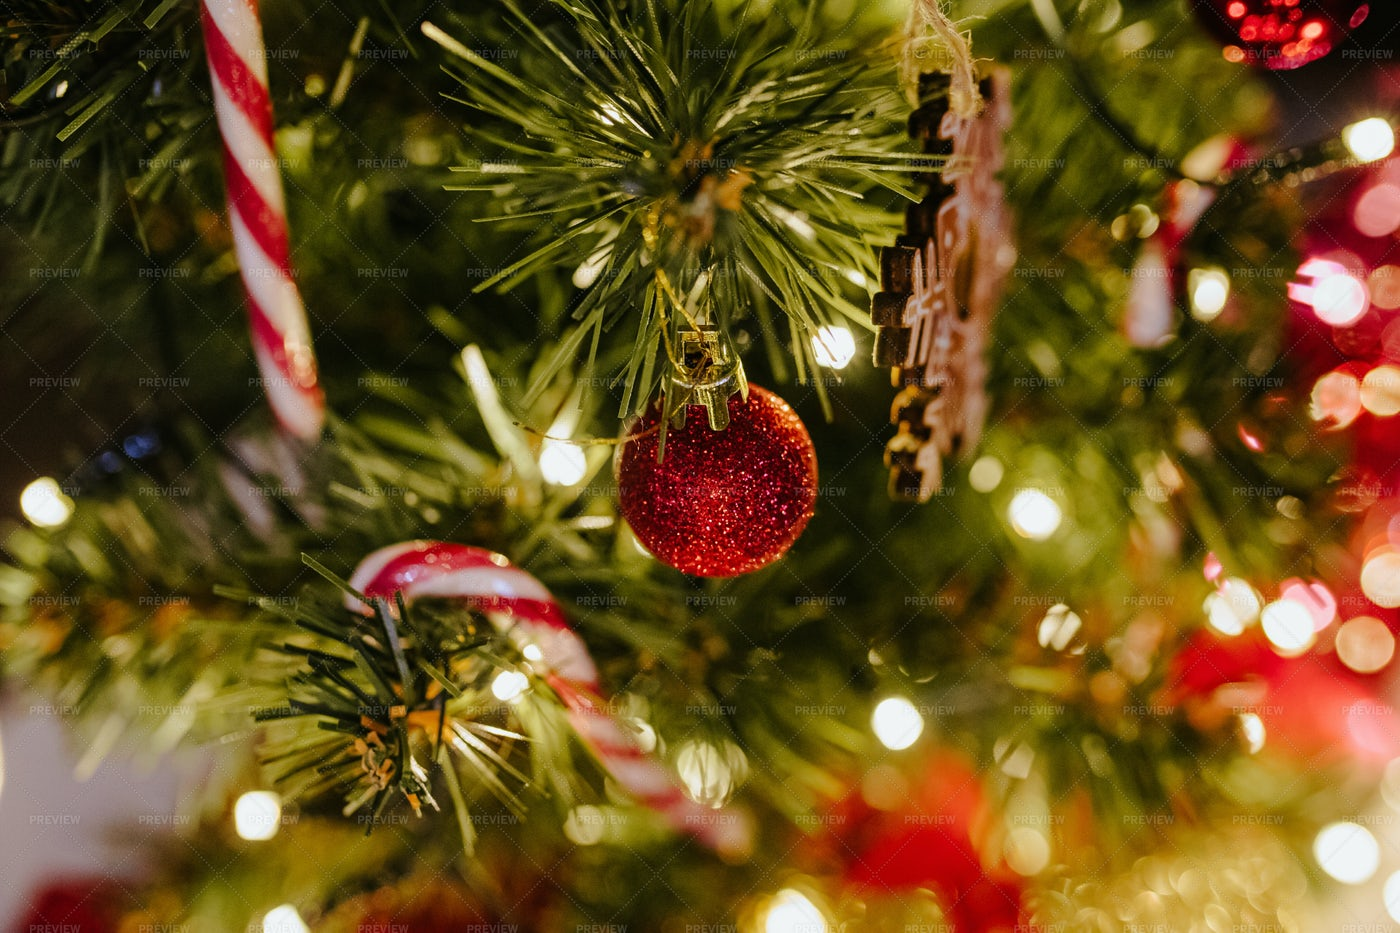 Bauble On Christmas Tree: Stock Photos